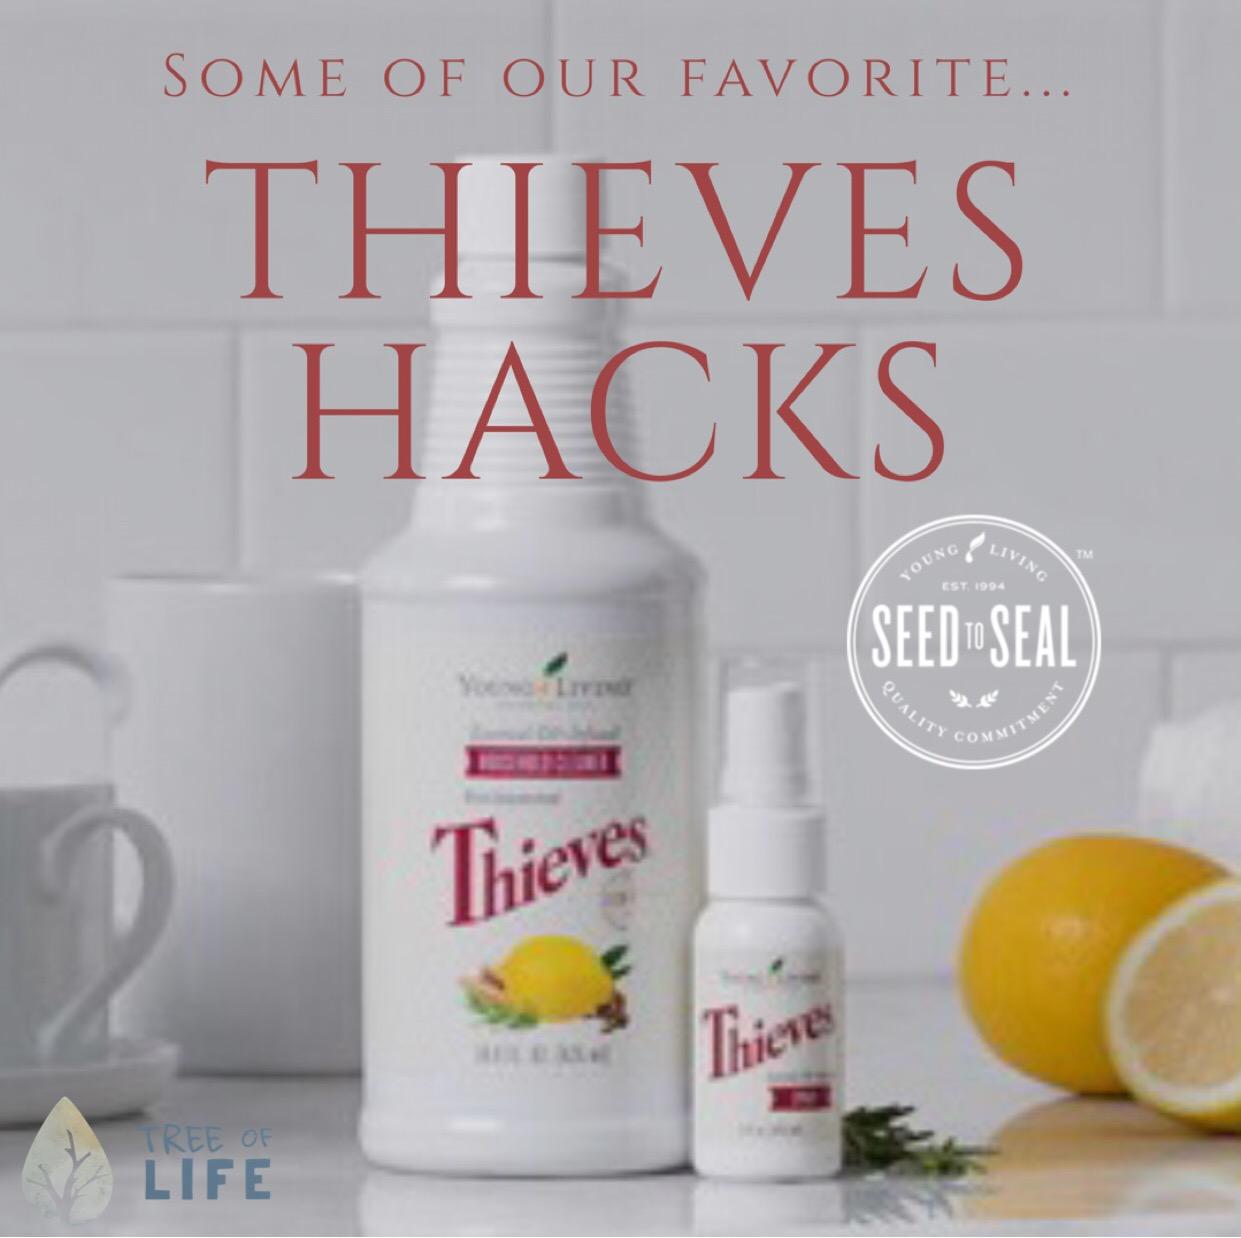 ThievesHacks.jpg